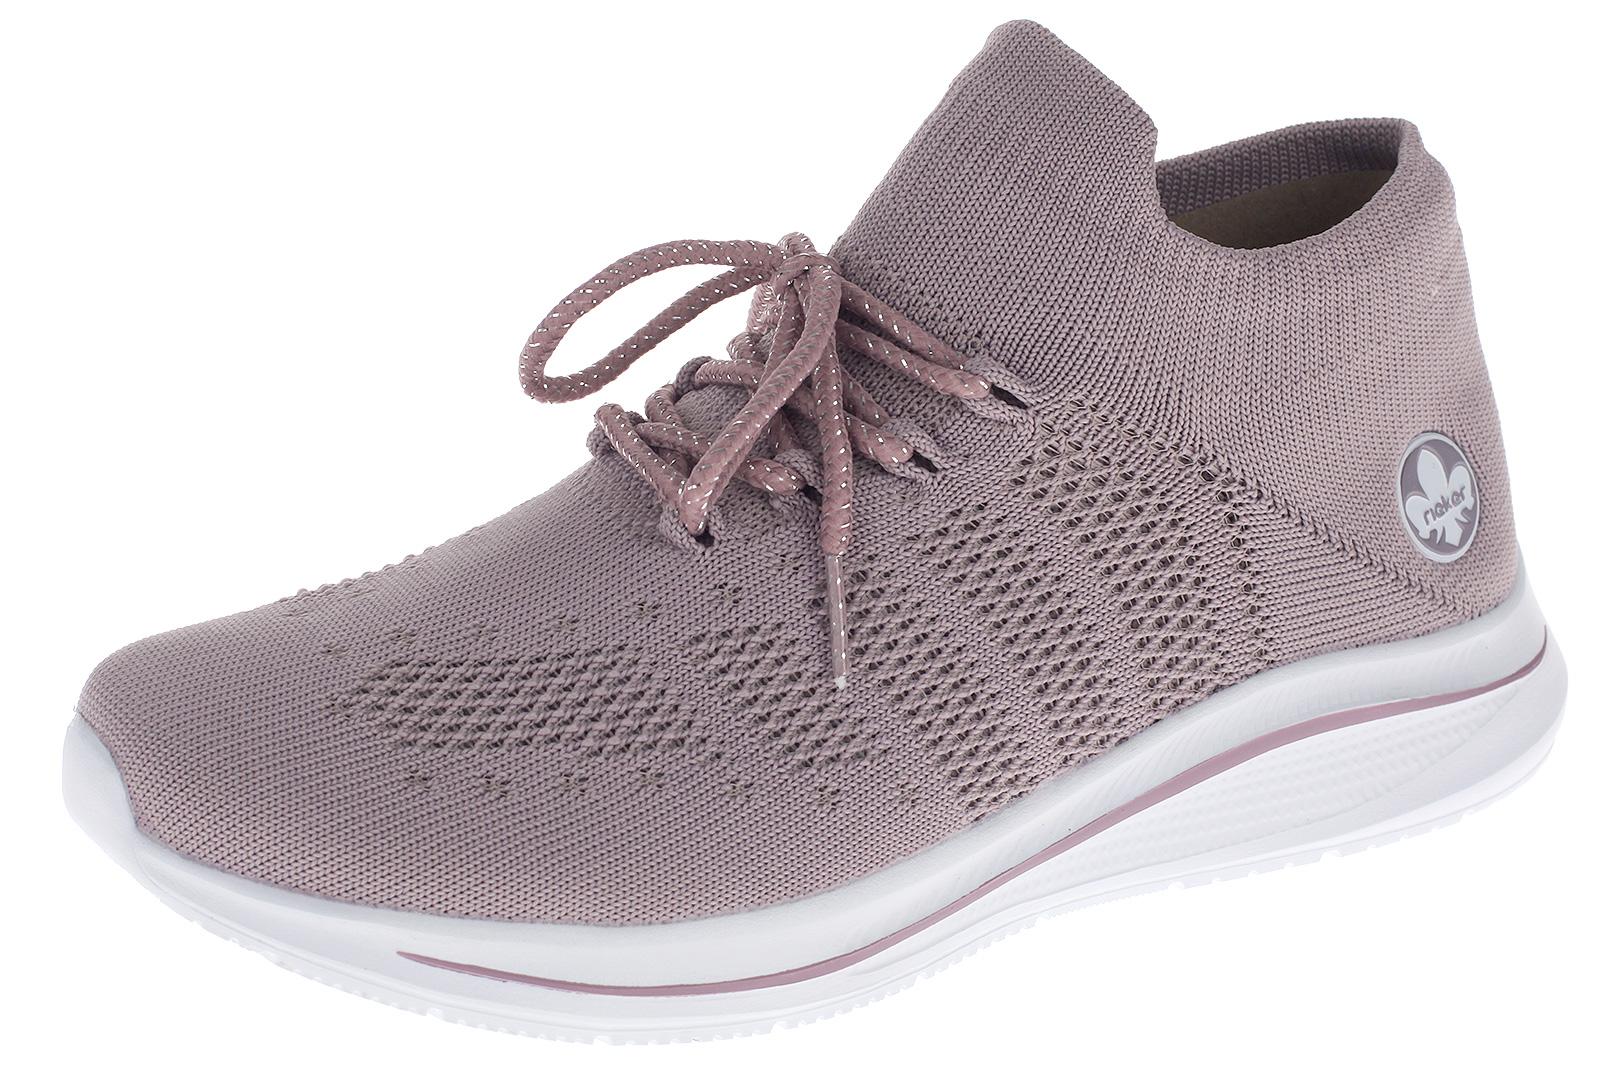 Rieker Damen Sneaker Socken Schuhe Slip Ons Sportschuhe Freizeit Schuhe Lila